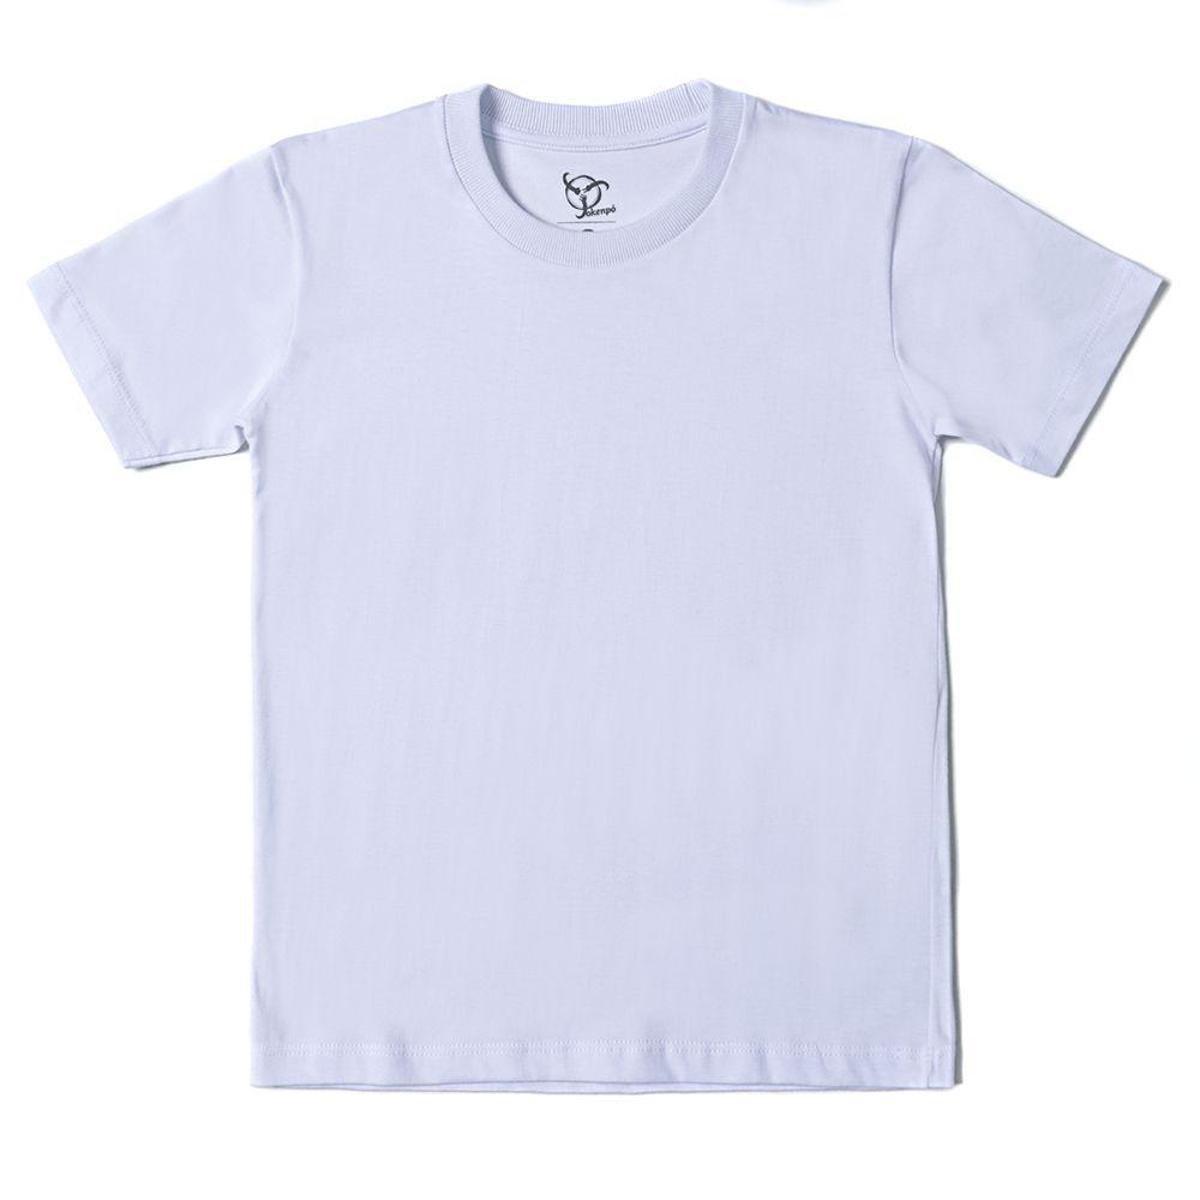 Kit 2 Camisetas Infantil Jokenpô Básica Masculina - Branco